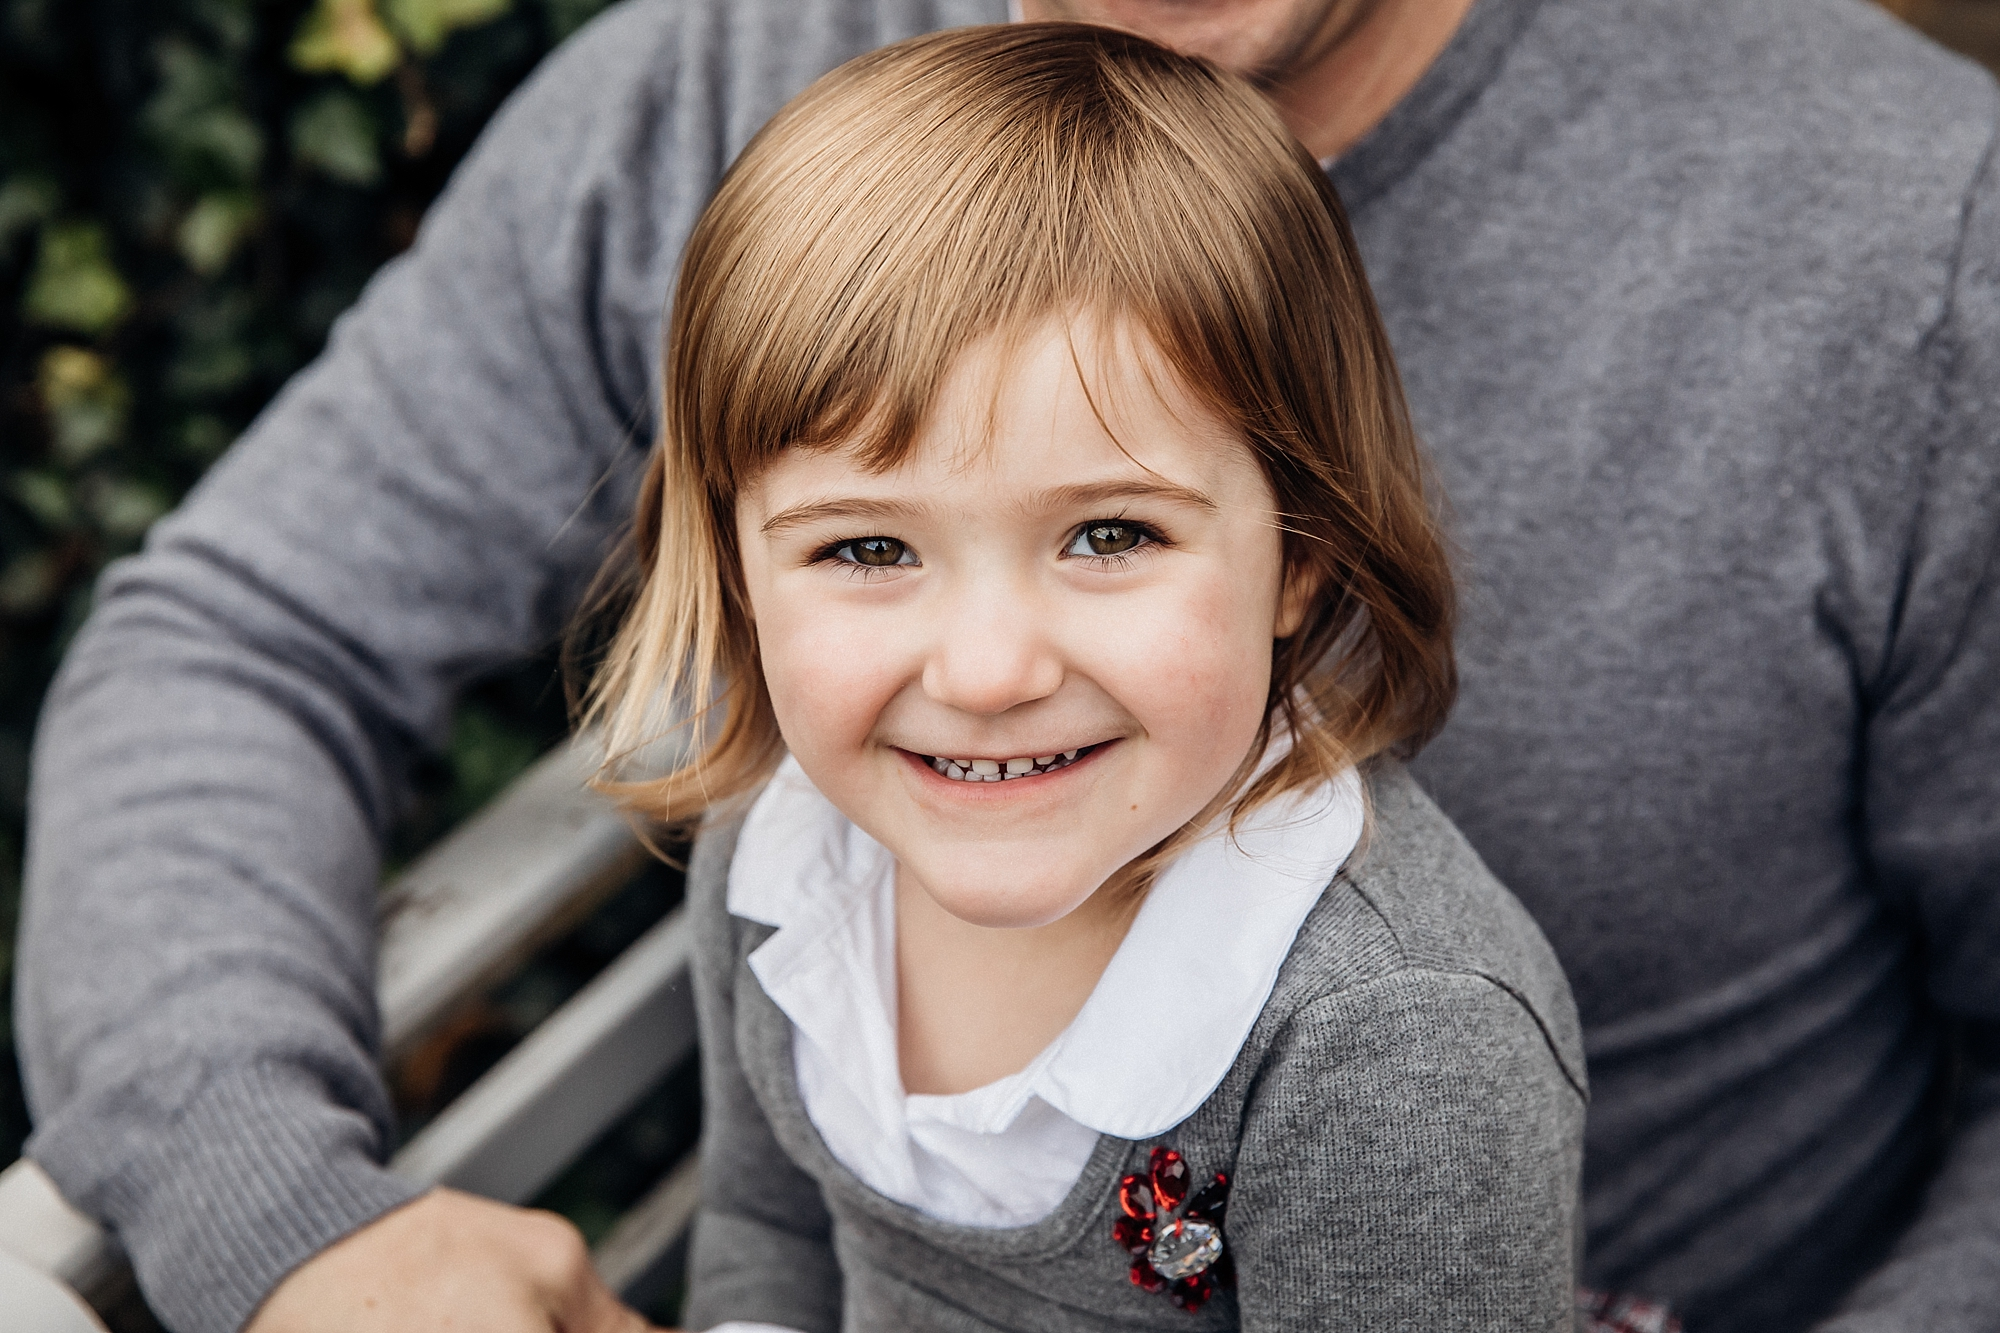 3 year old girl looking at camera with big eyes